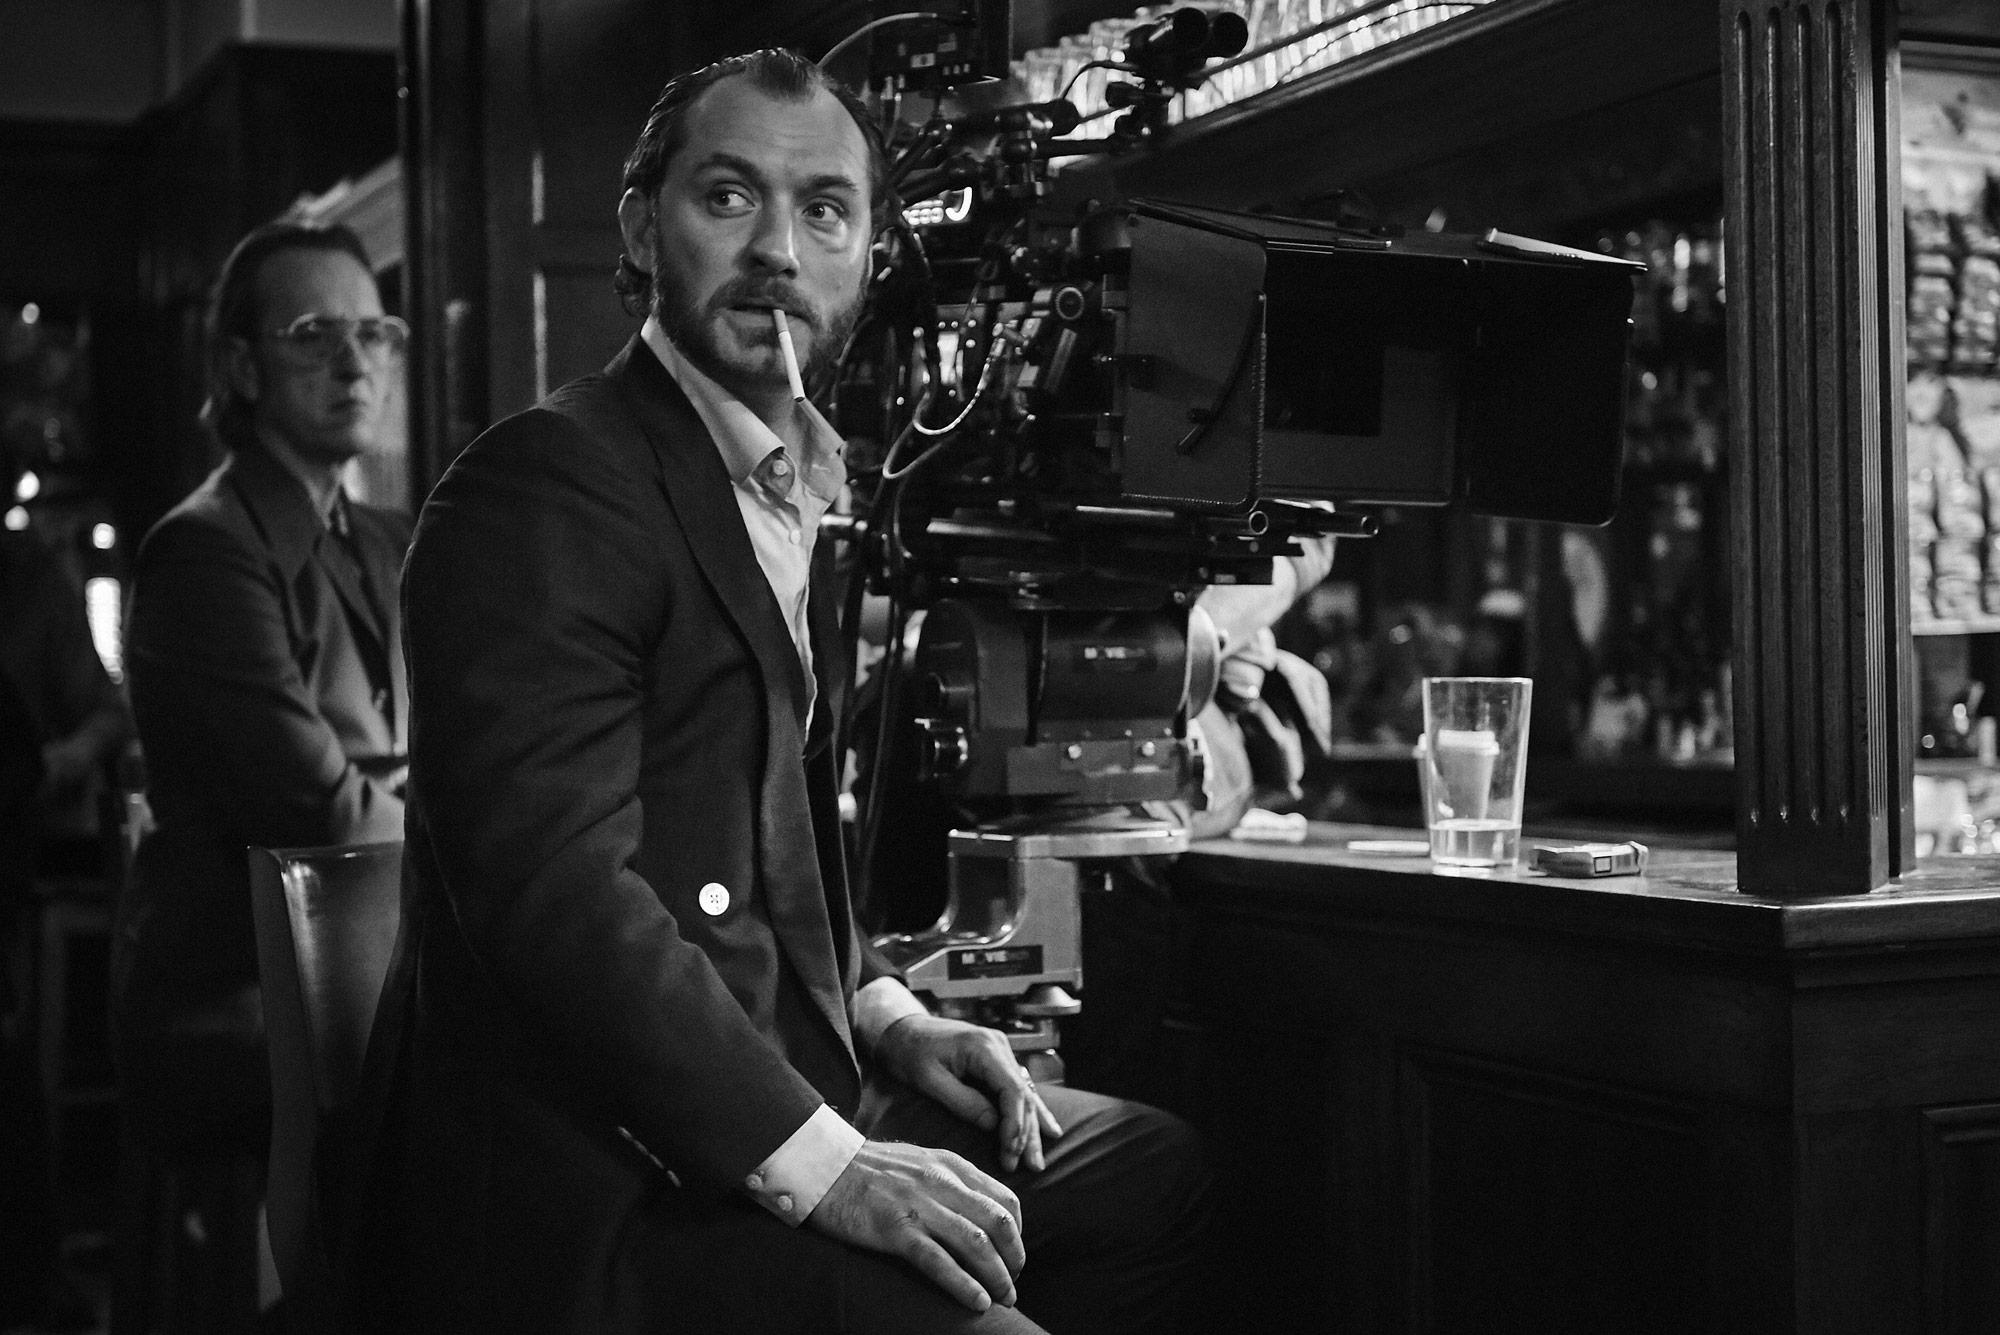 Jude Law | Dom Hemingway